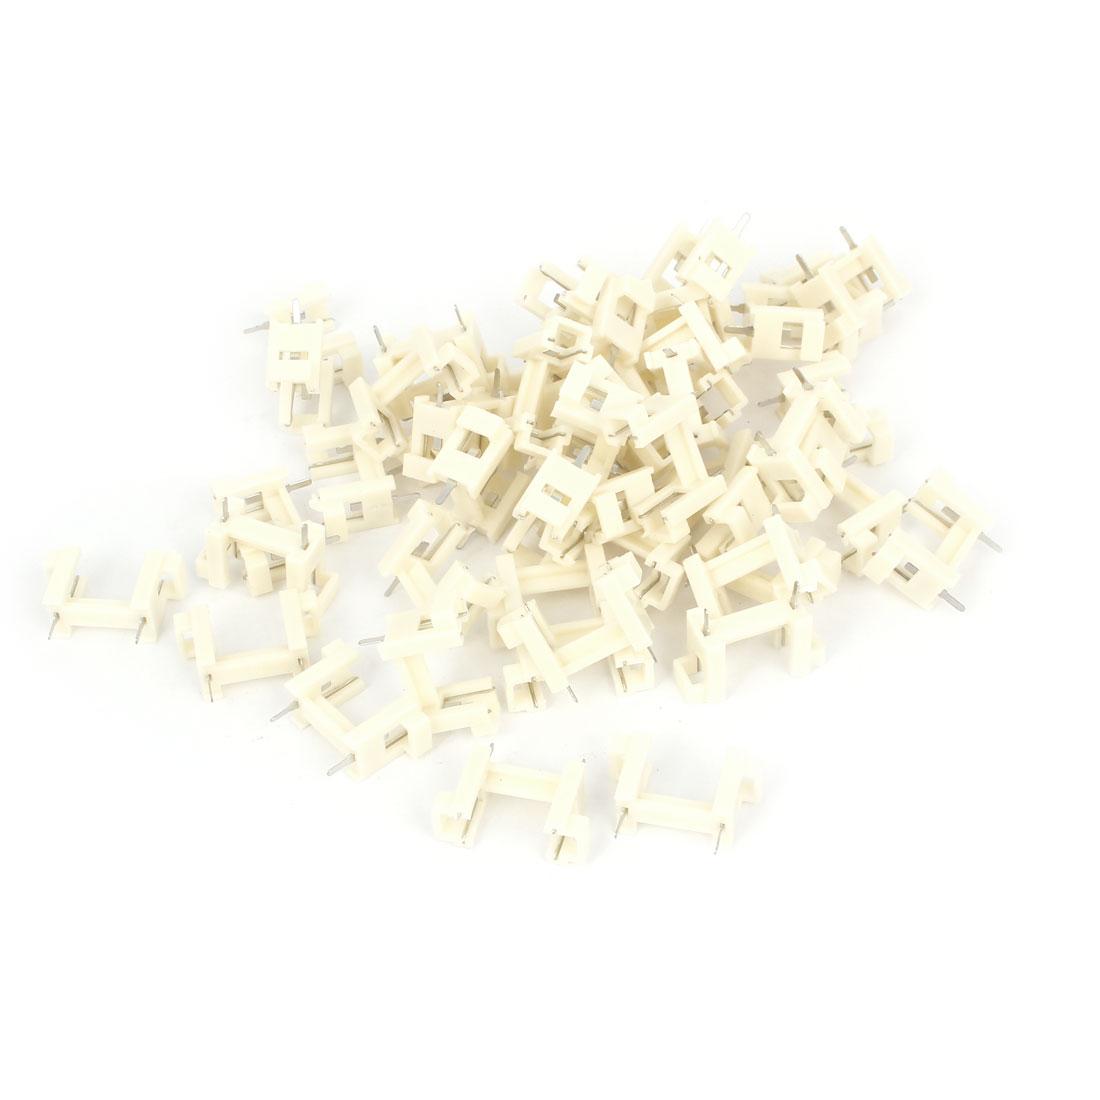 50pcs Plastic Shell DIP Type 5mm x 20mm Fuse Tube Holders White